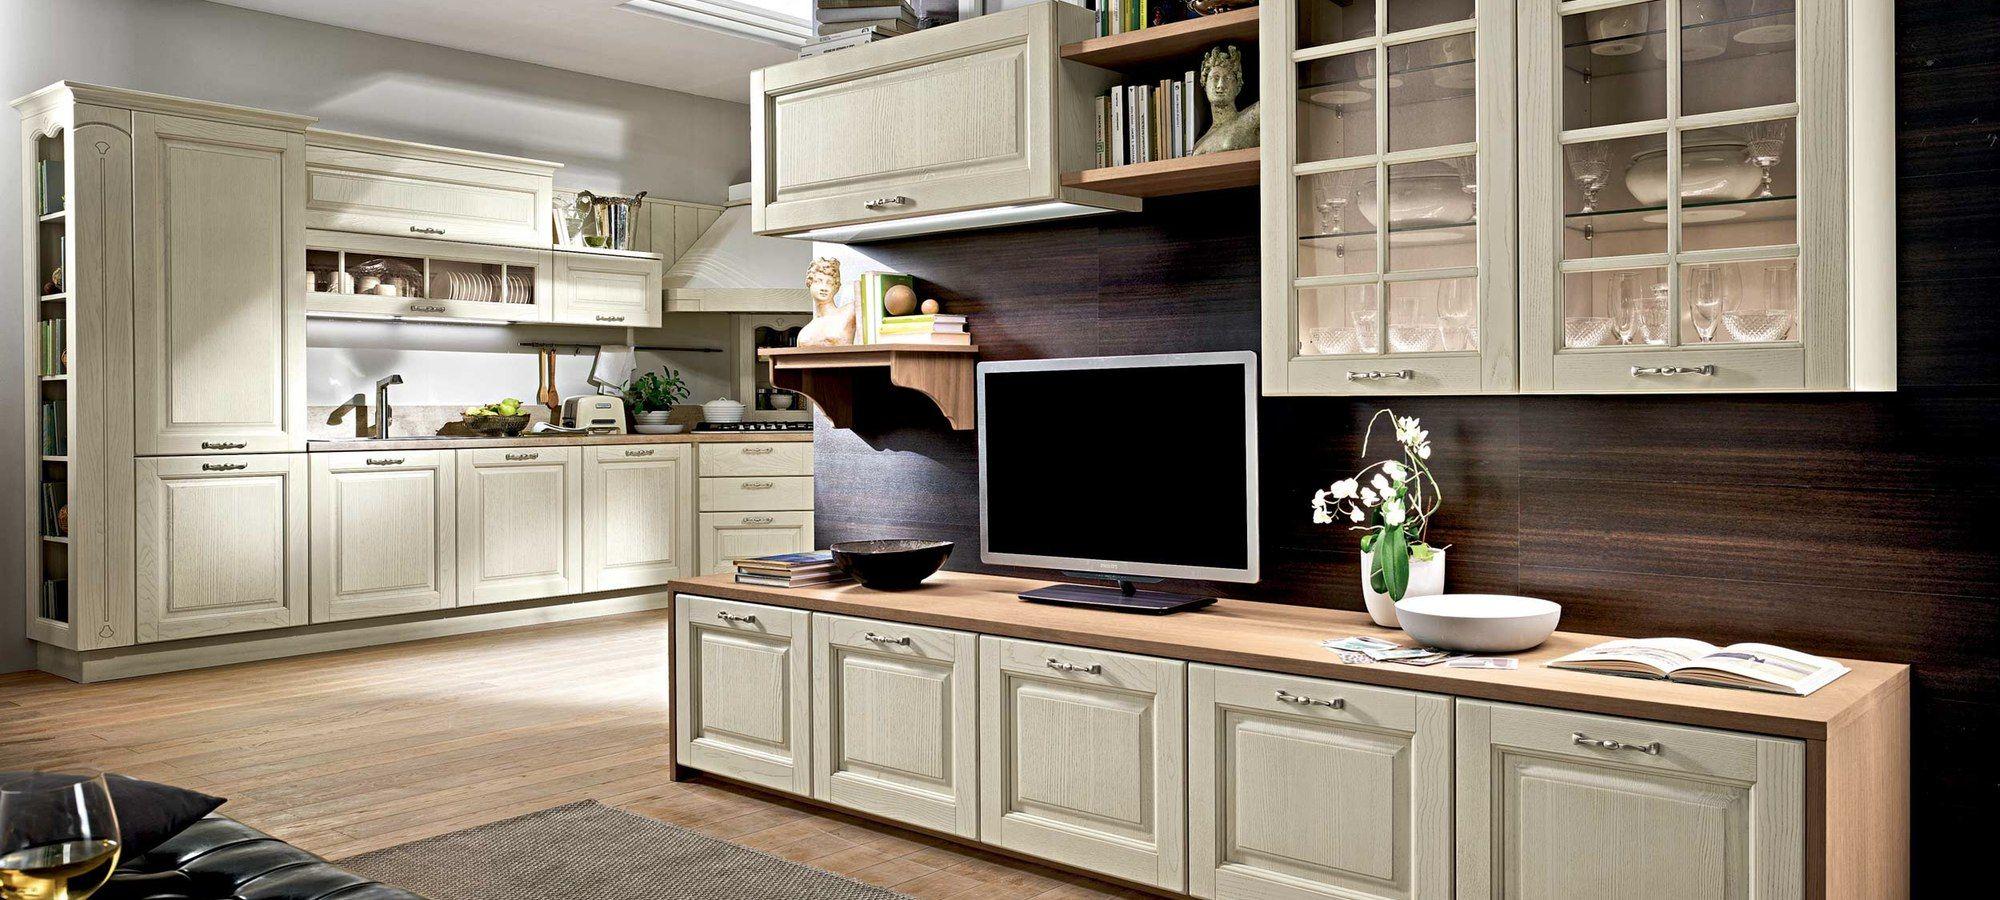 Cucine classiche – Stosa Cucine | Cucine | Cucine, Classico ...